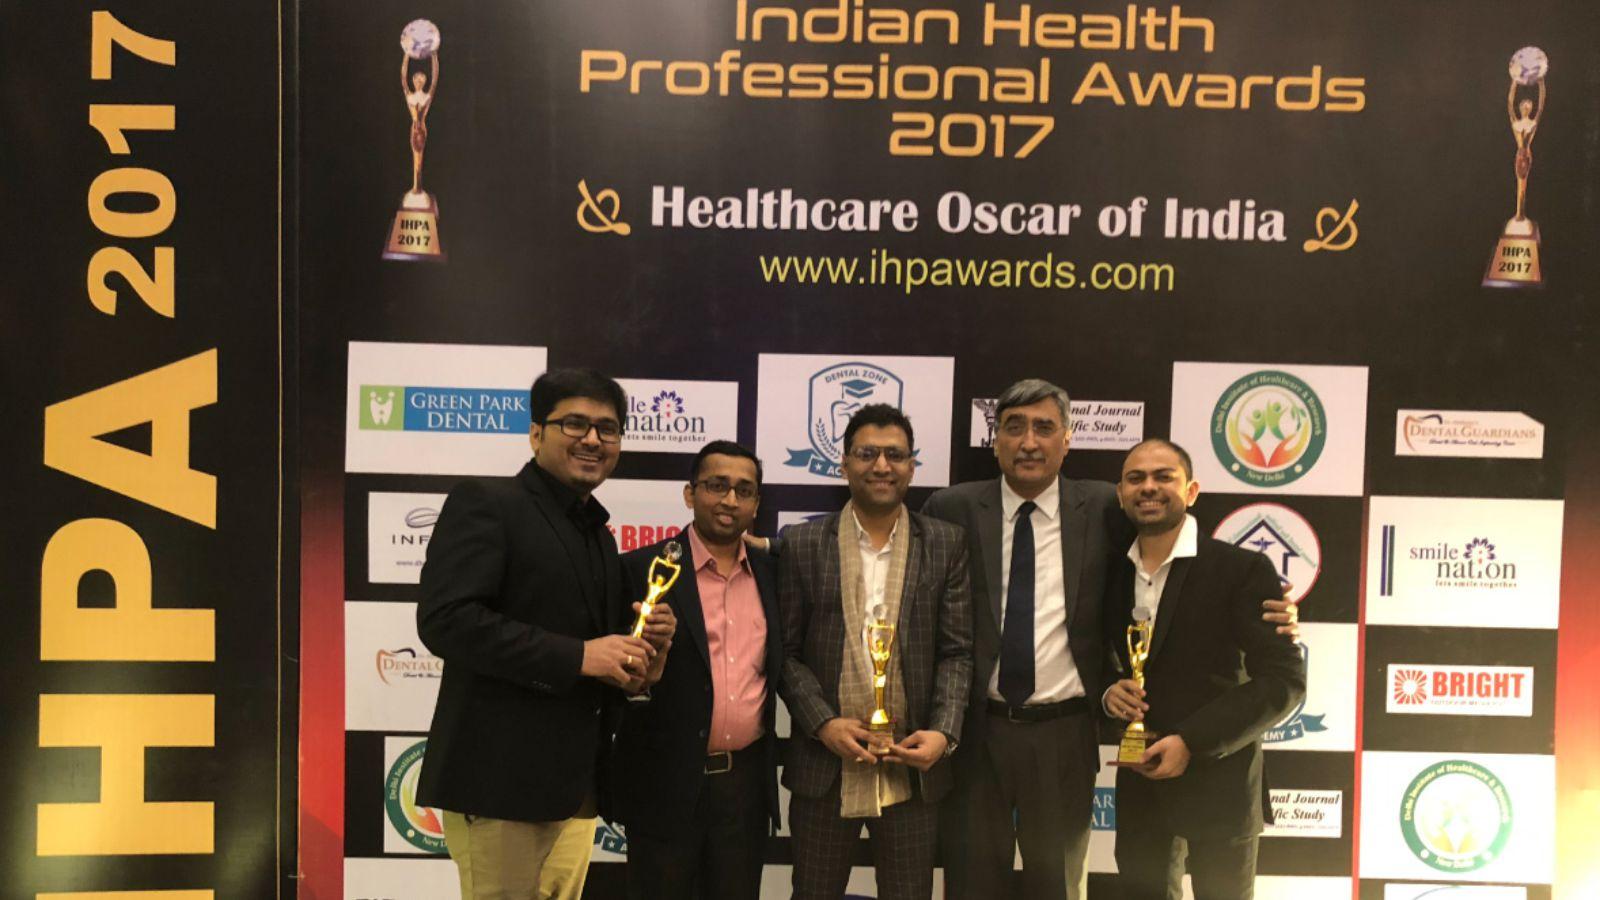 KSD – Indian Health Professional Awards 2017 Image